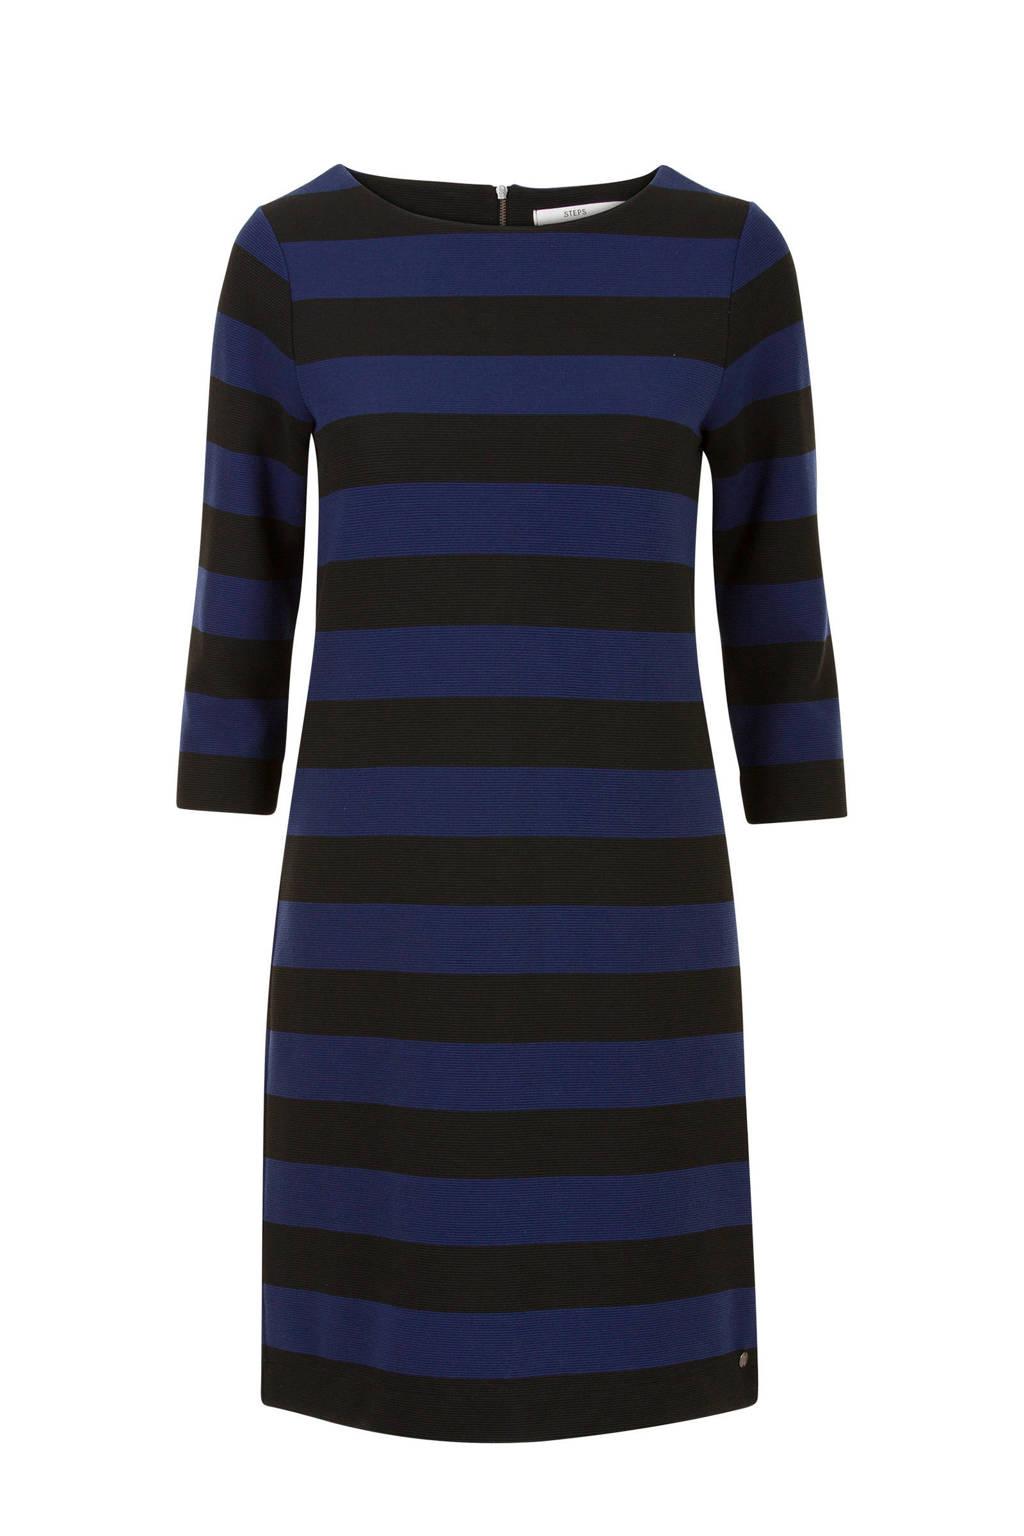 Steps gestreepte jurk blauw, Blauw